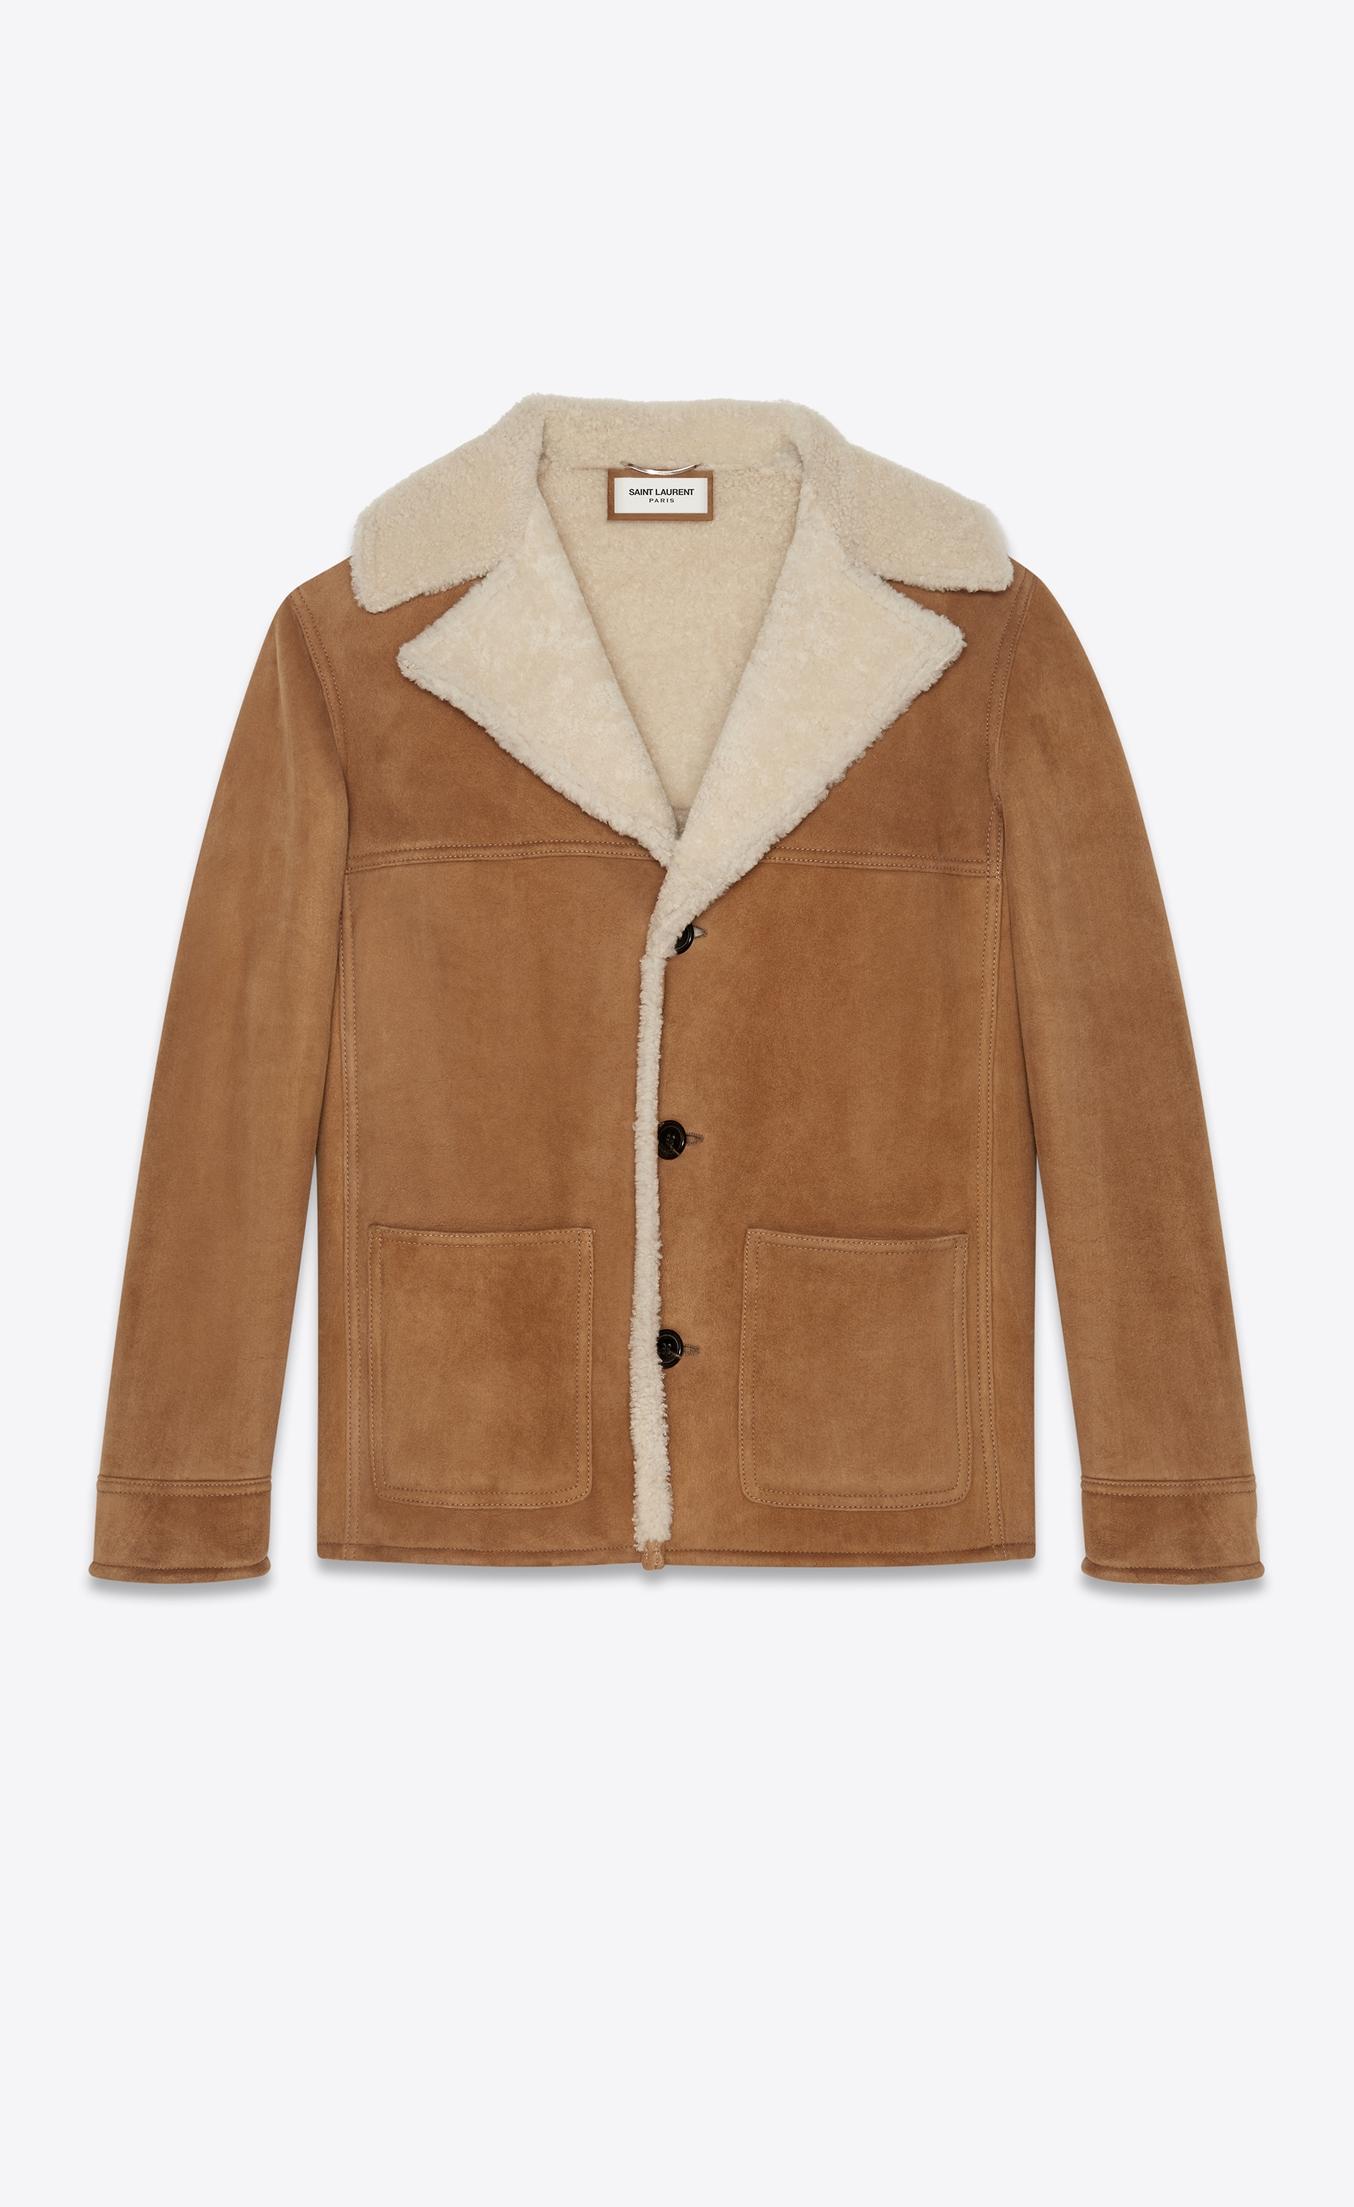 YSL Trapper Coat